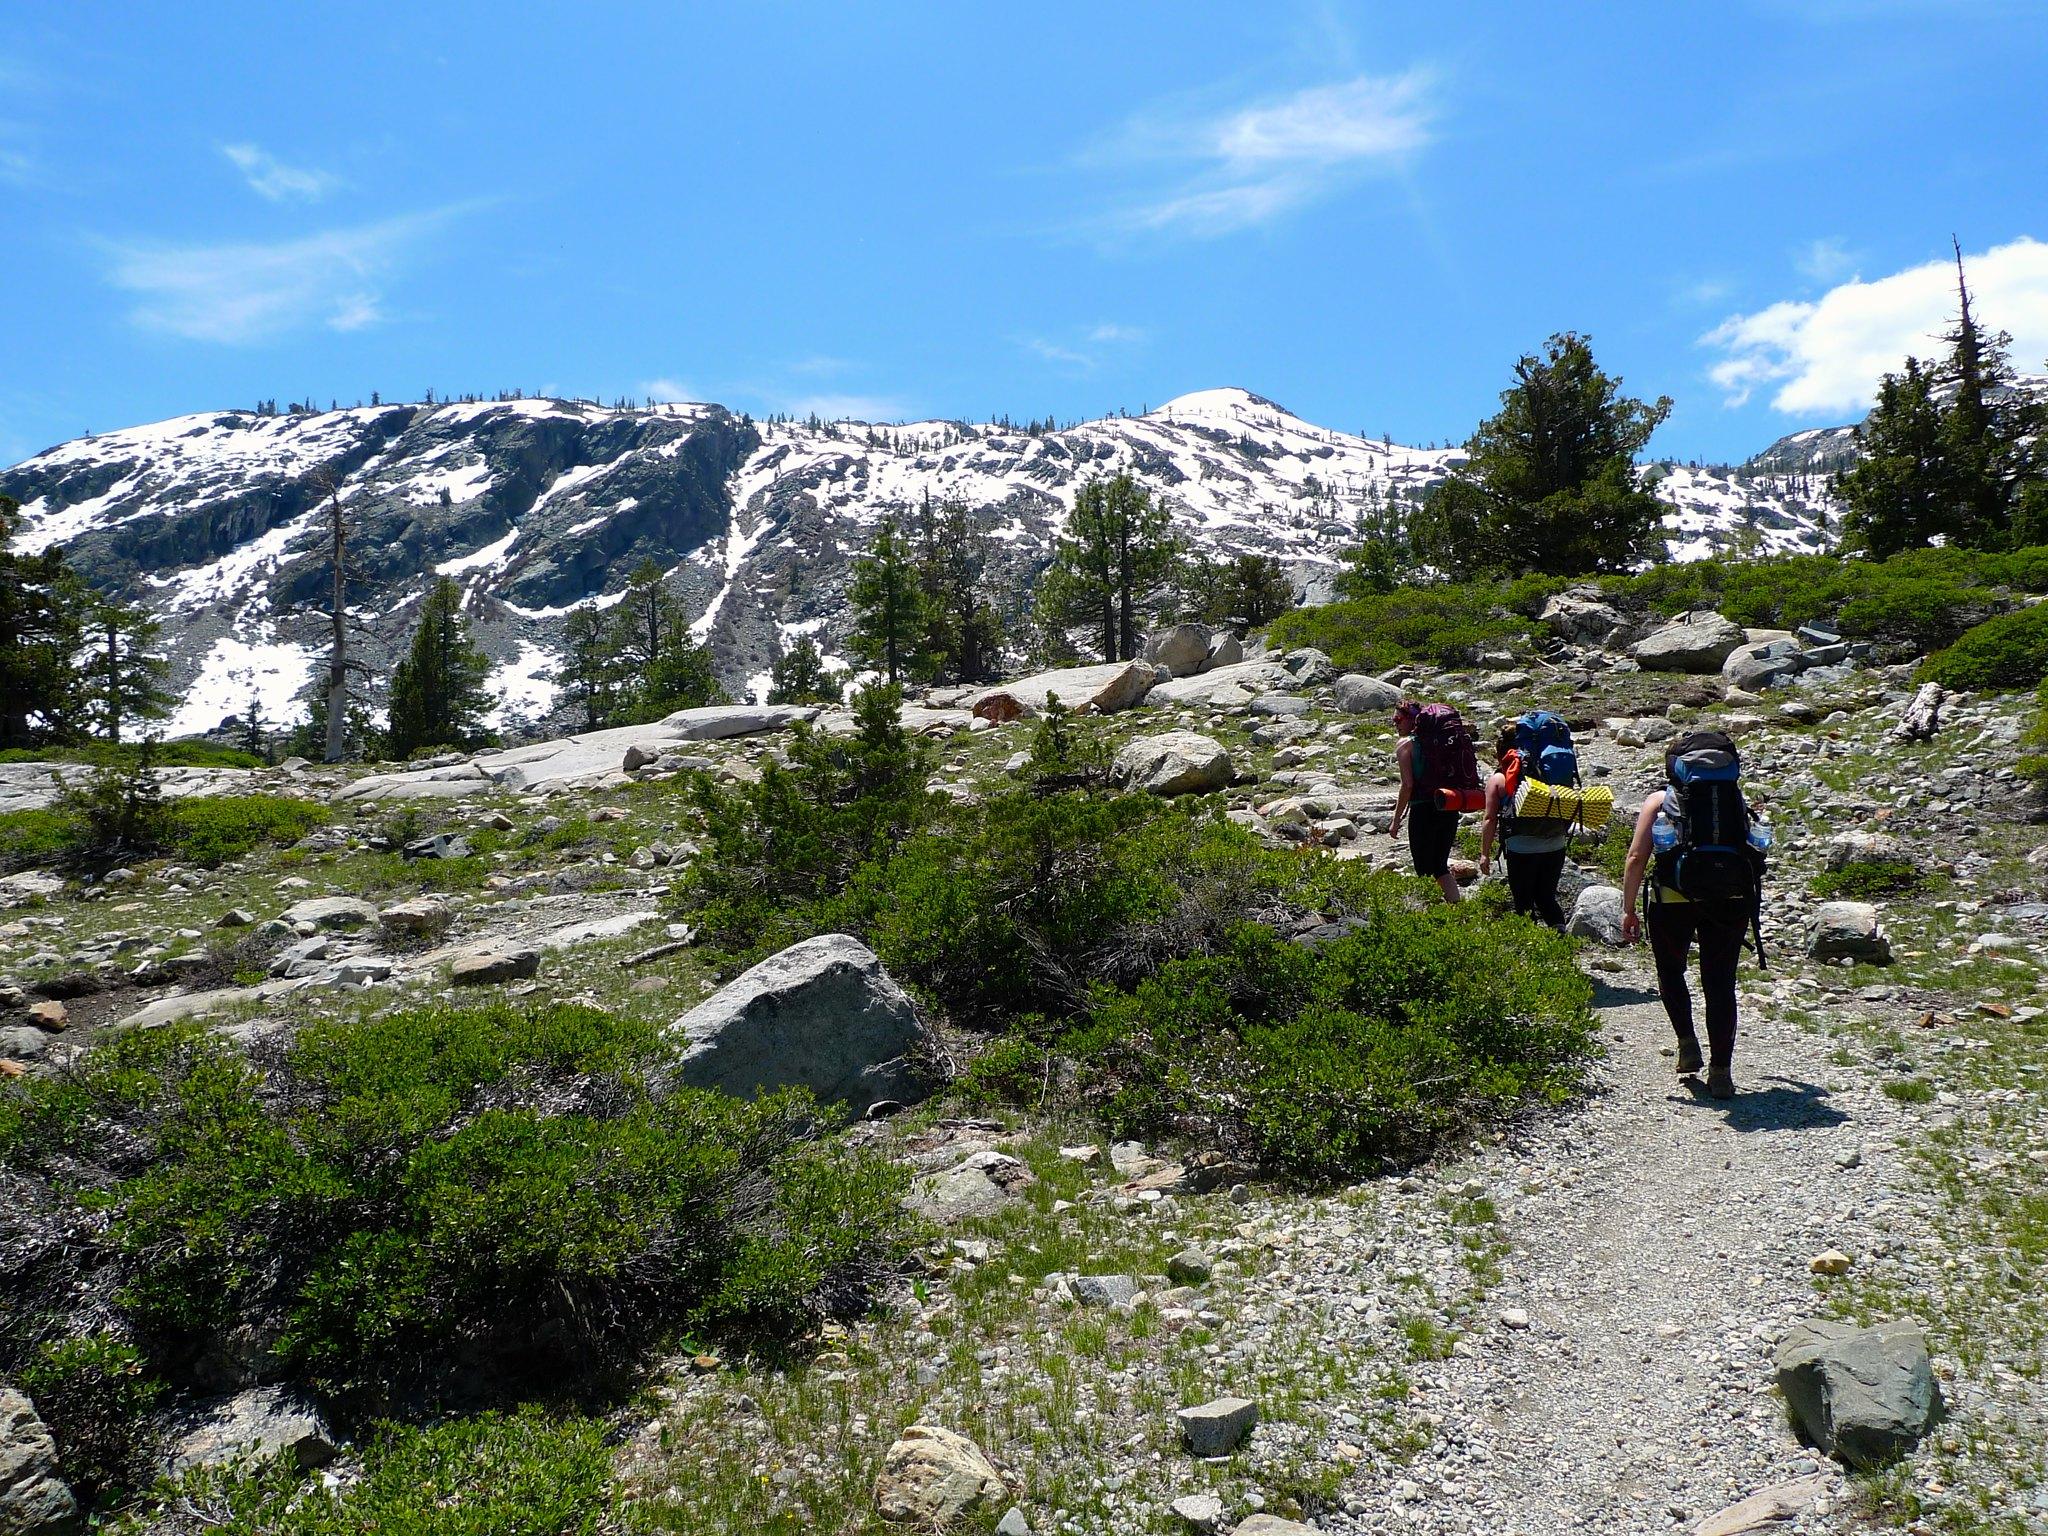 Heading up Glen Alpine Trail